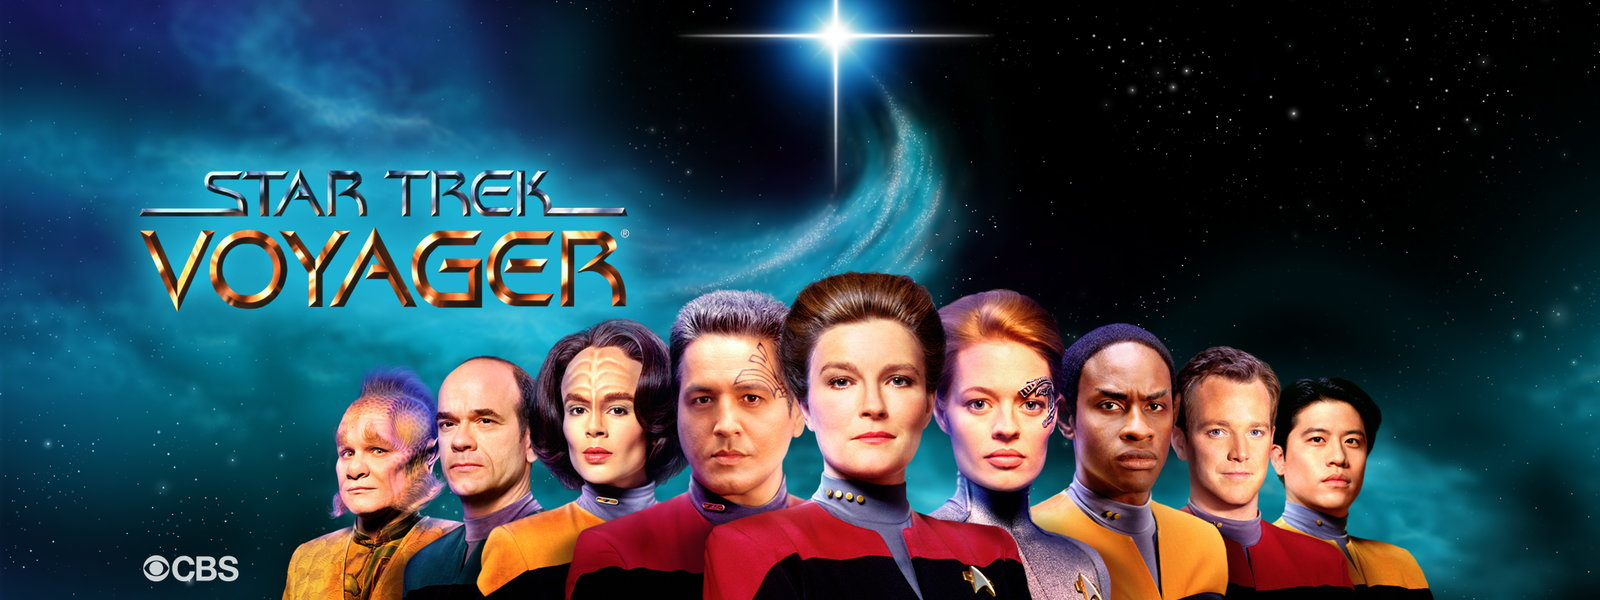 Watch Star Trek: Voyager Online at Hulu